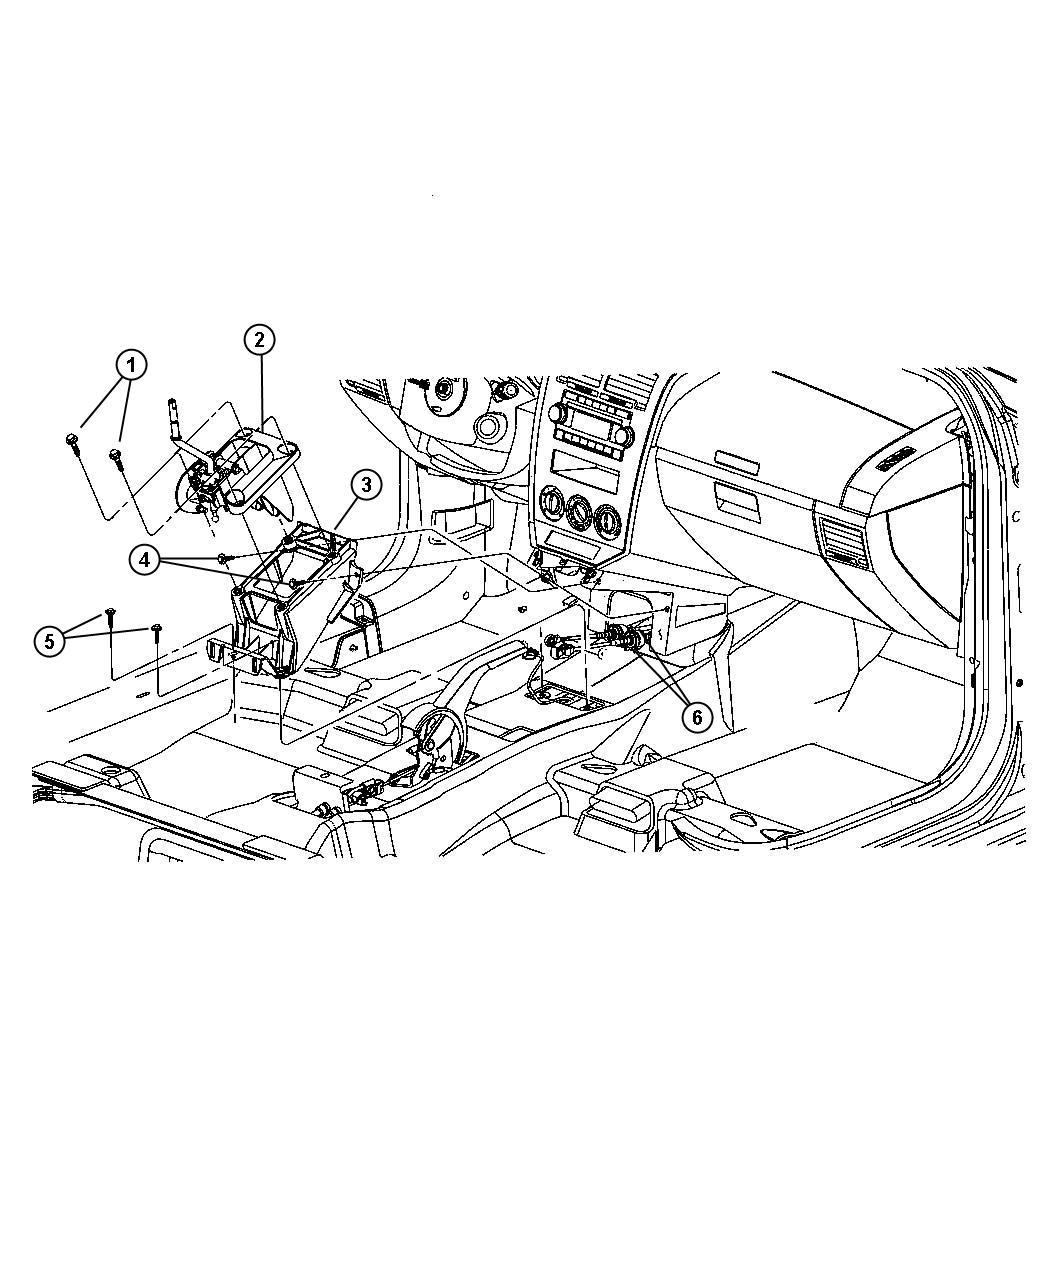 Jeep Patriot Shifter. Transmission. Mopar, lever, gear